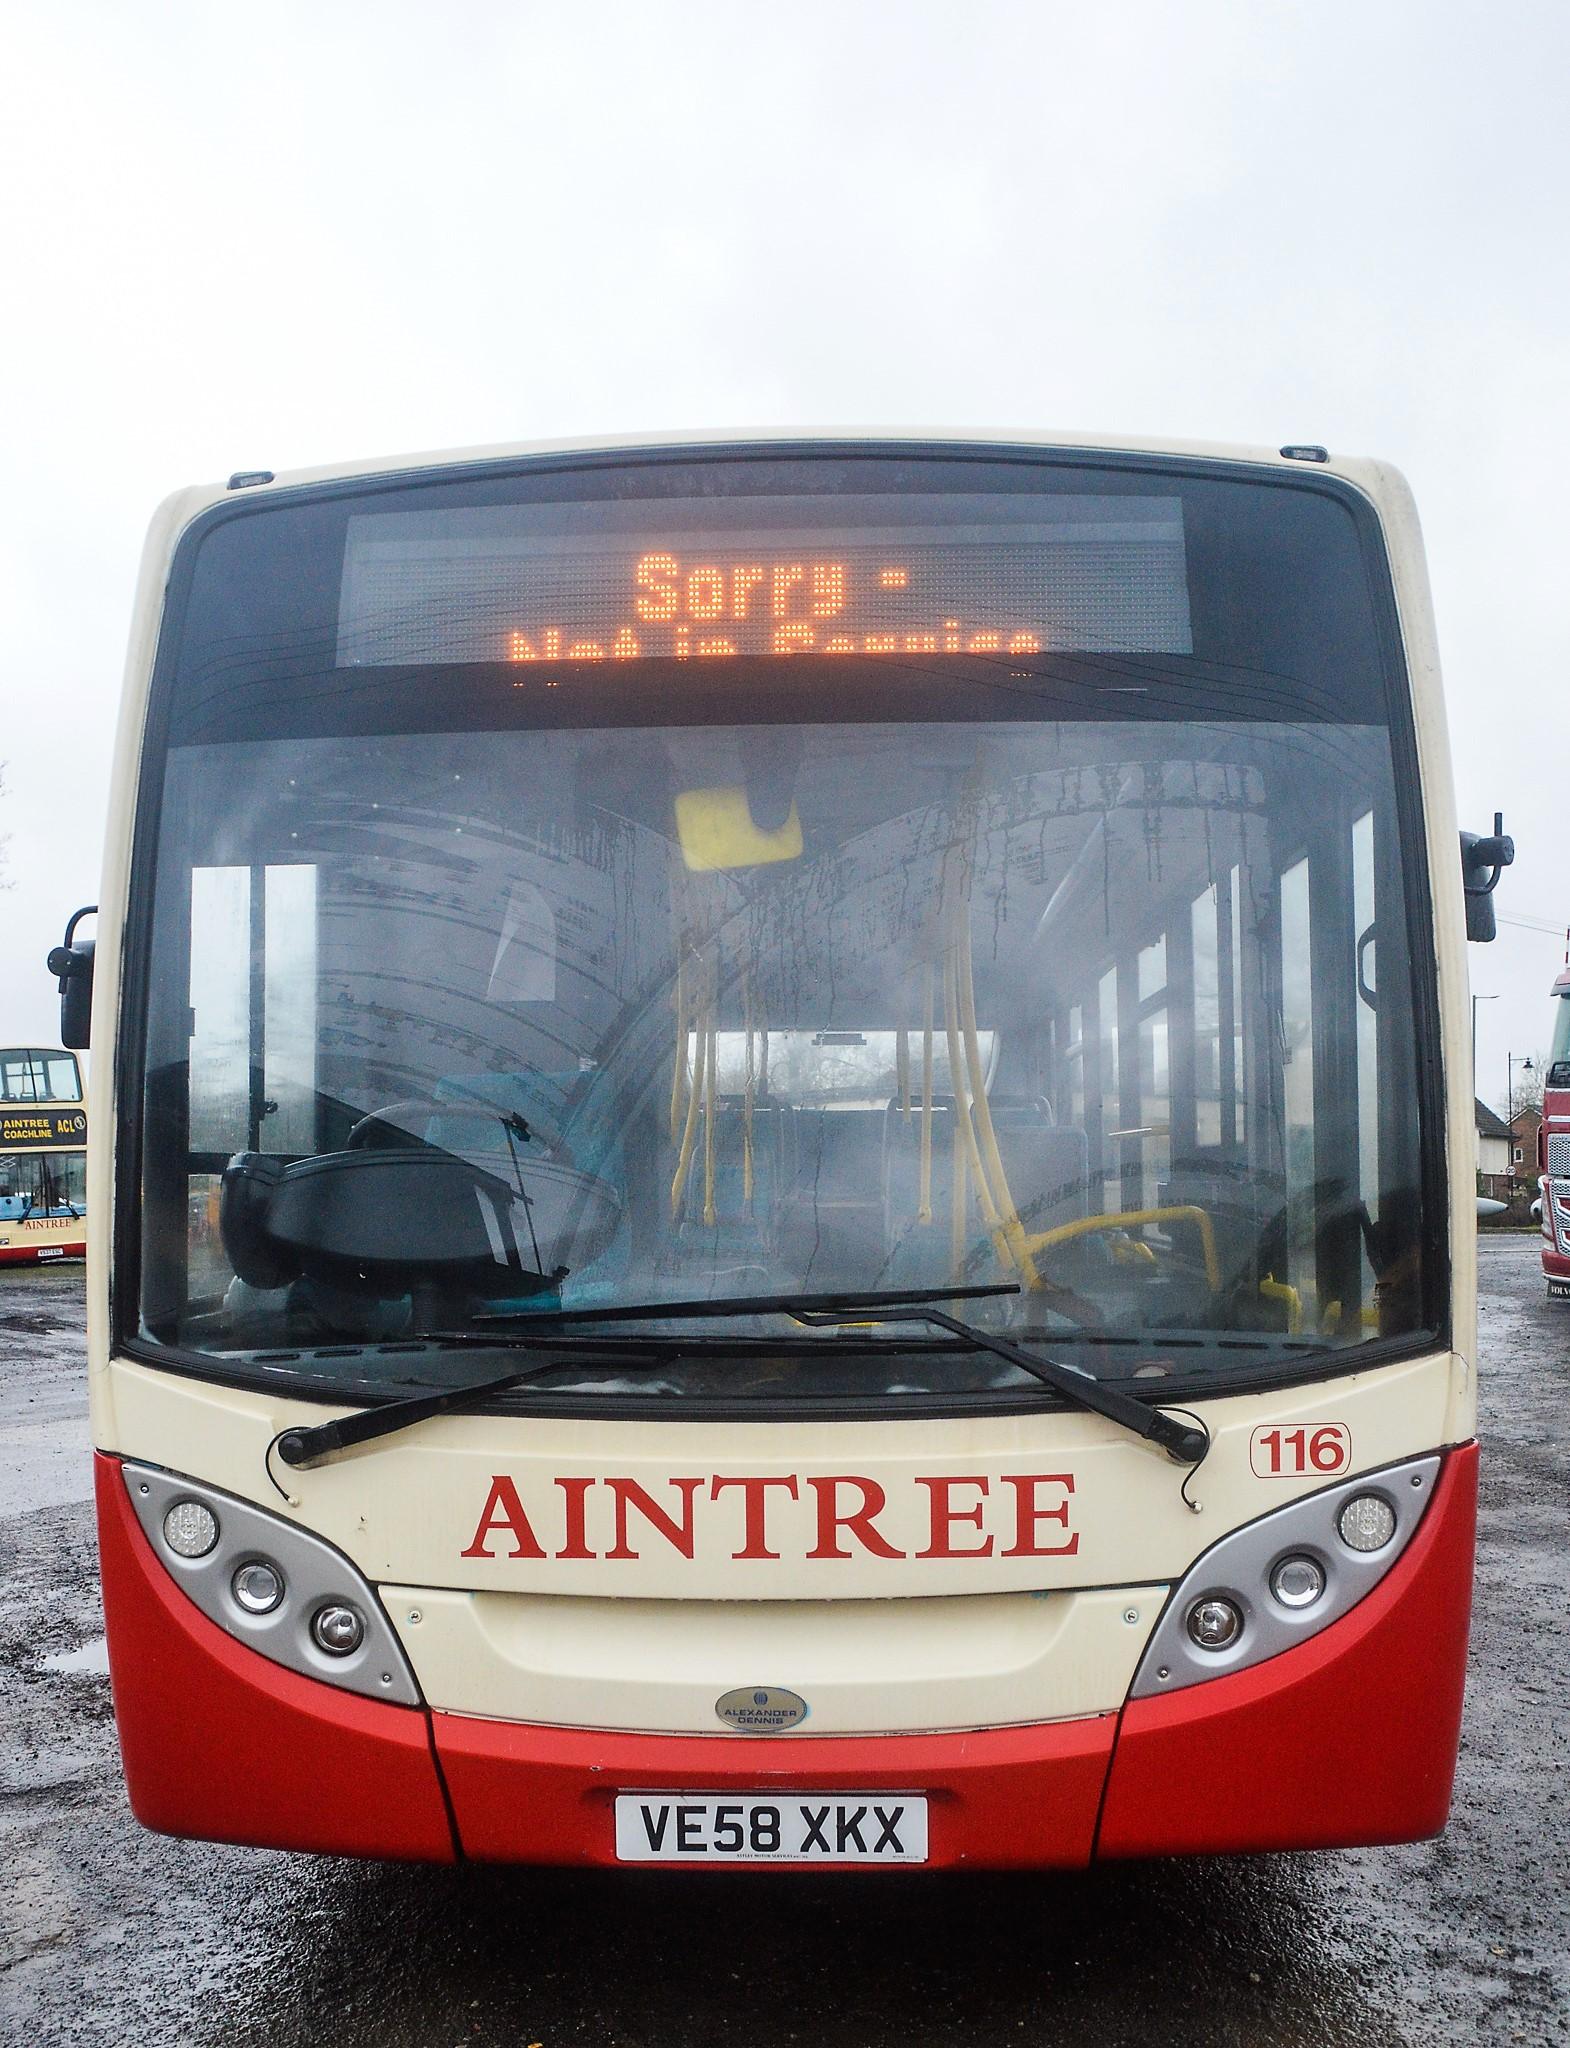 Lot 4 - Alexander Dennis Dart 4 Enviro 2000 29 seat single deck service bus Registration Number: VE58 XKX